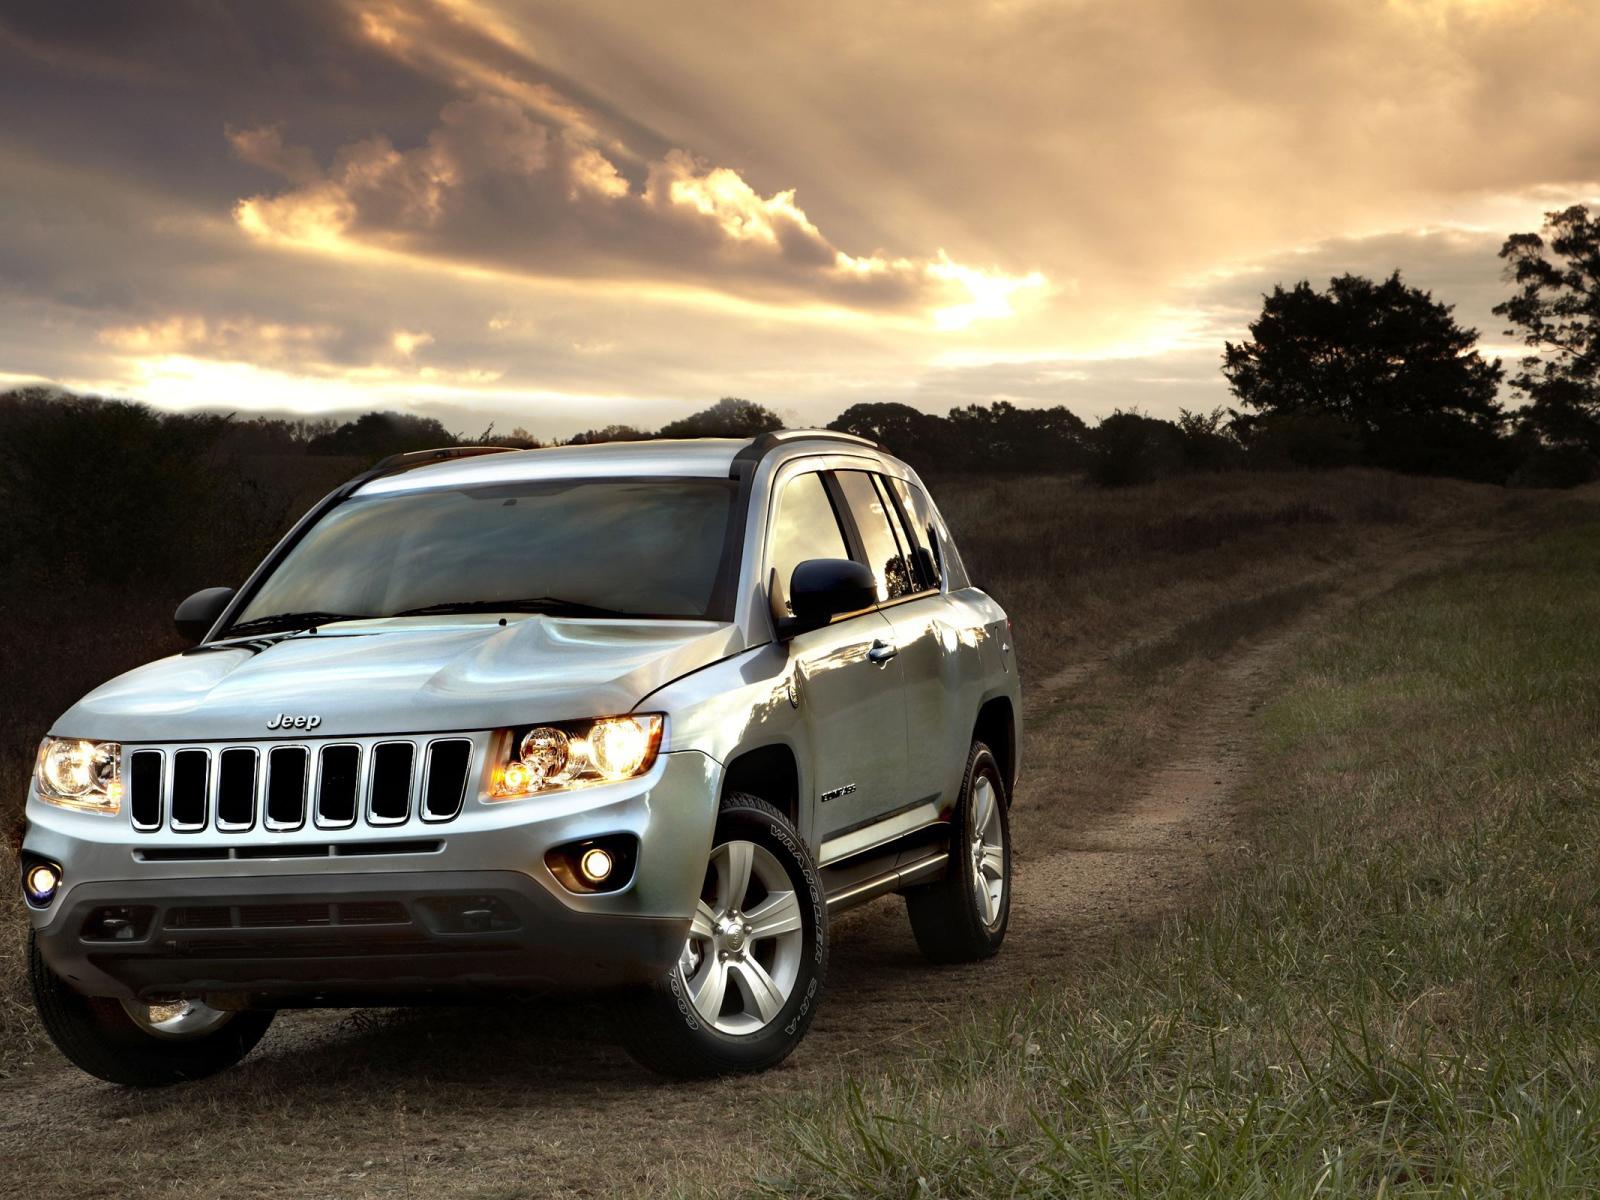 click select set as desktop background desktop wallpapers auto jeep 1600x1200